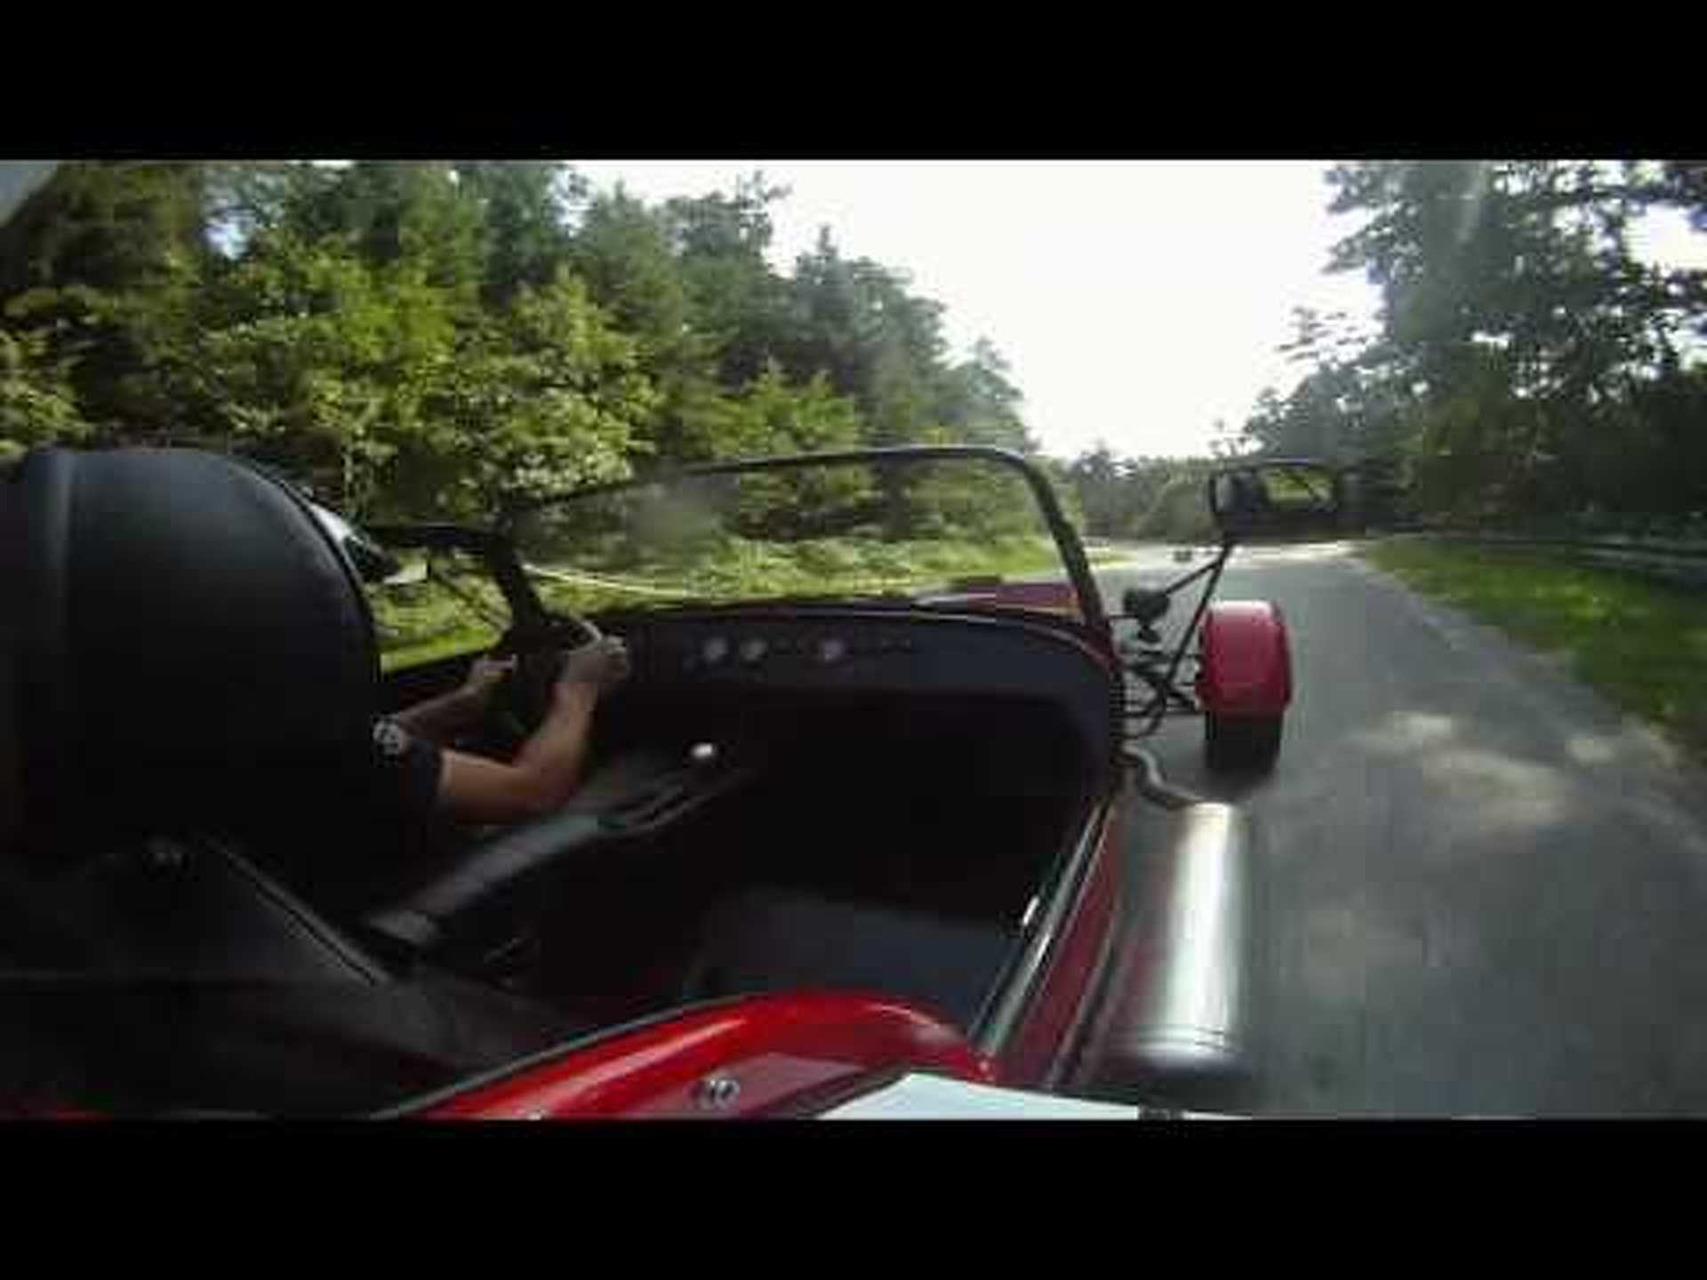 Caterham Roadsport 175 SV - Classicauto Cup tor